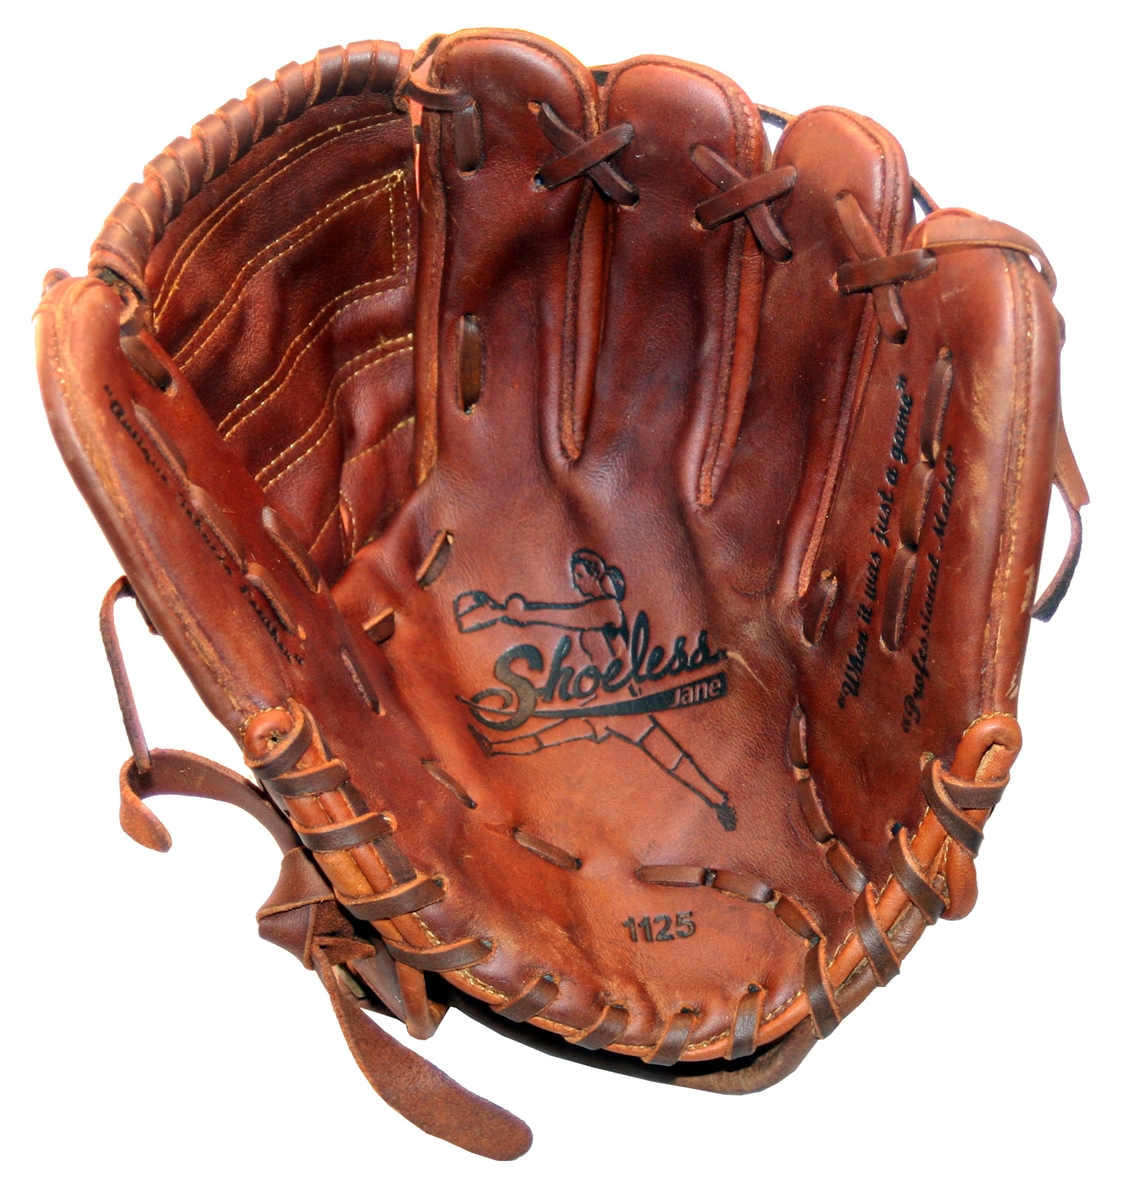 Softball and glove